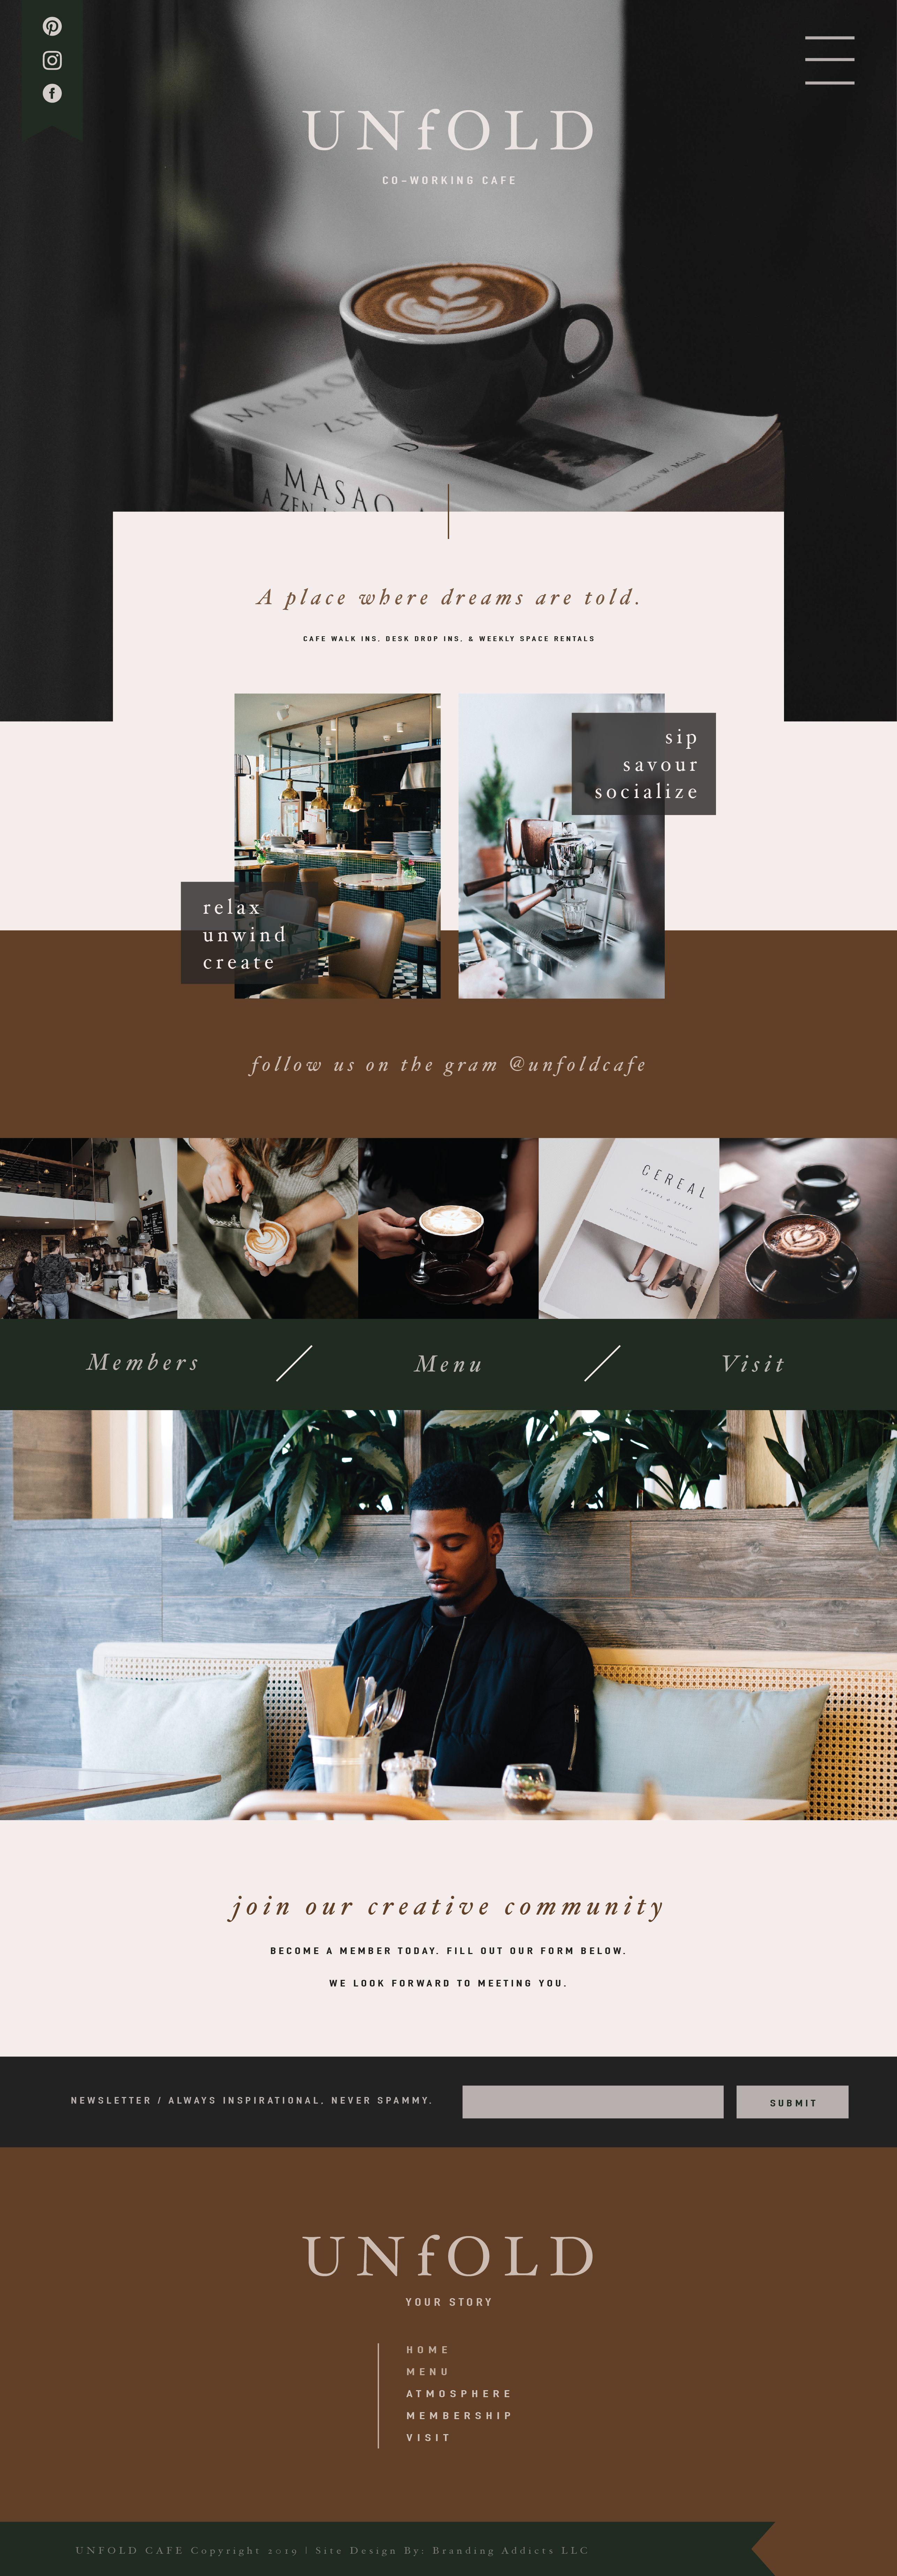 Unfold Co Working Cafe Branding Web Design Coffee Shop Branding Cafe Branding Portfolio Design